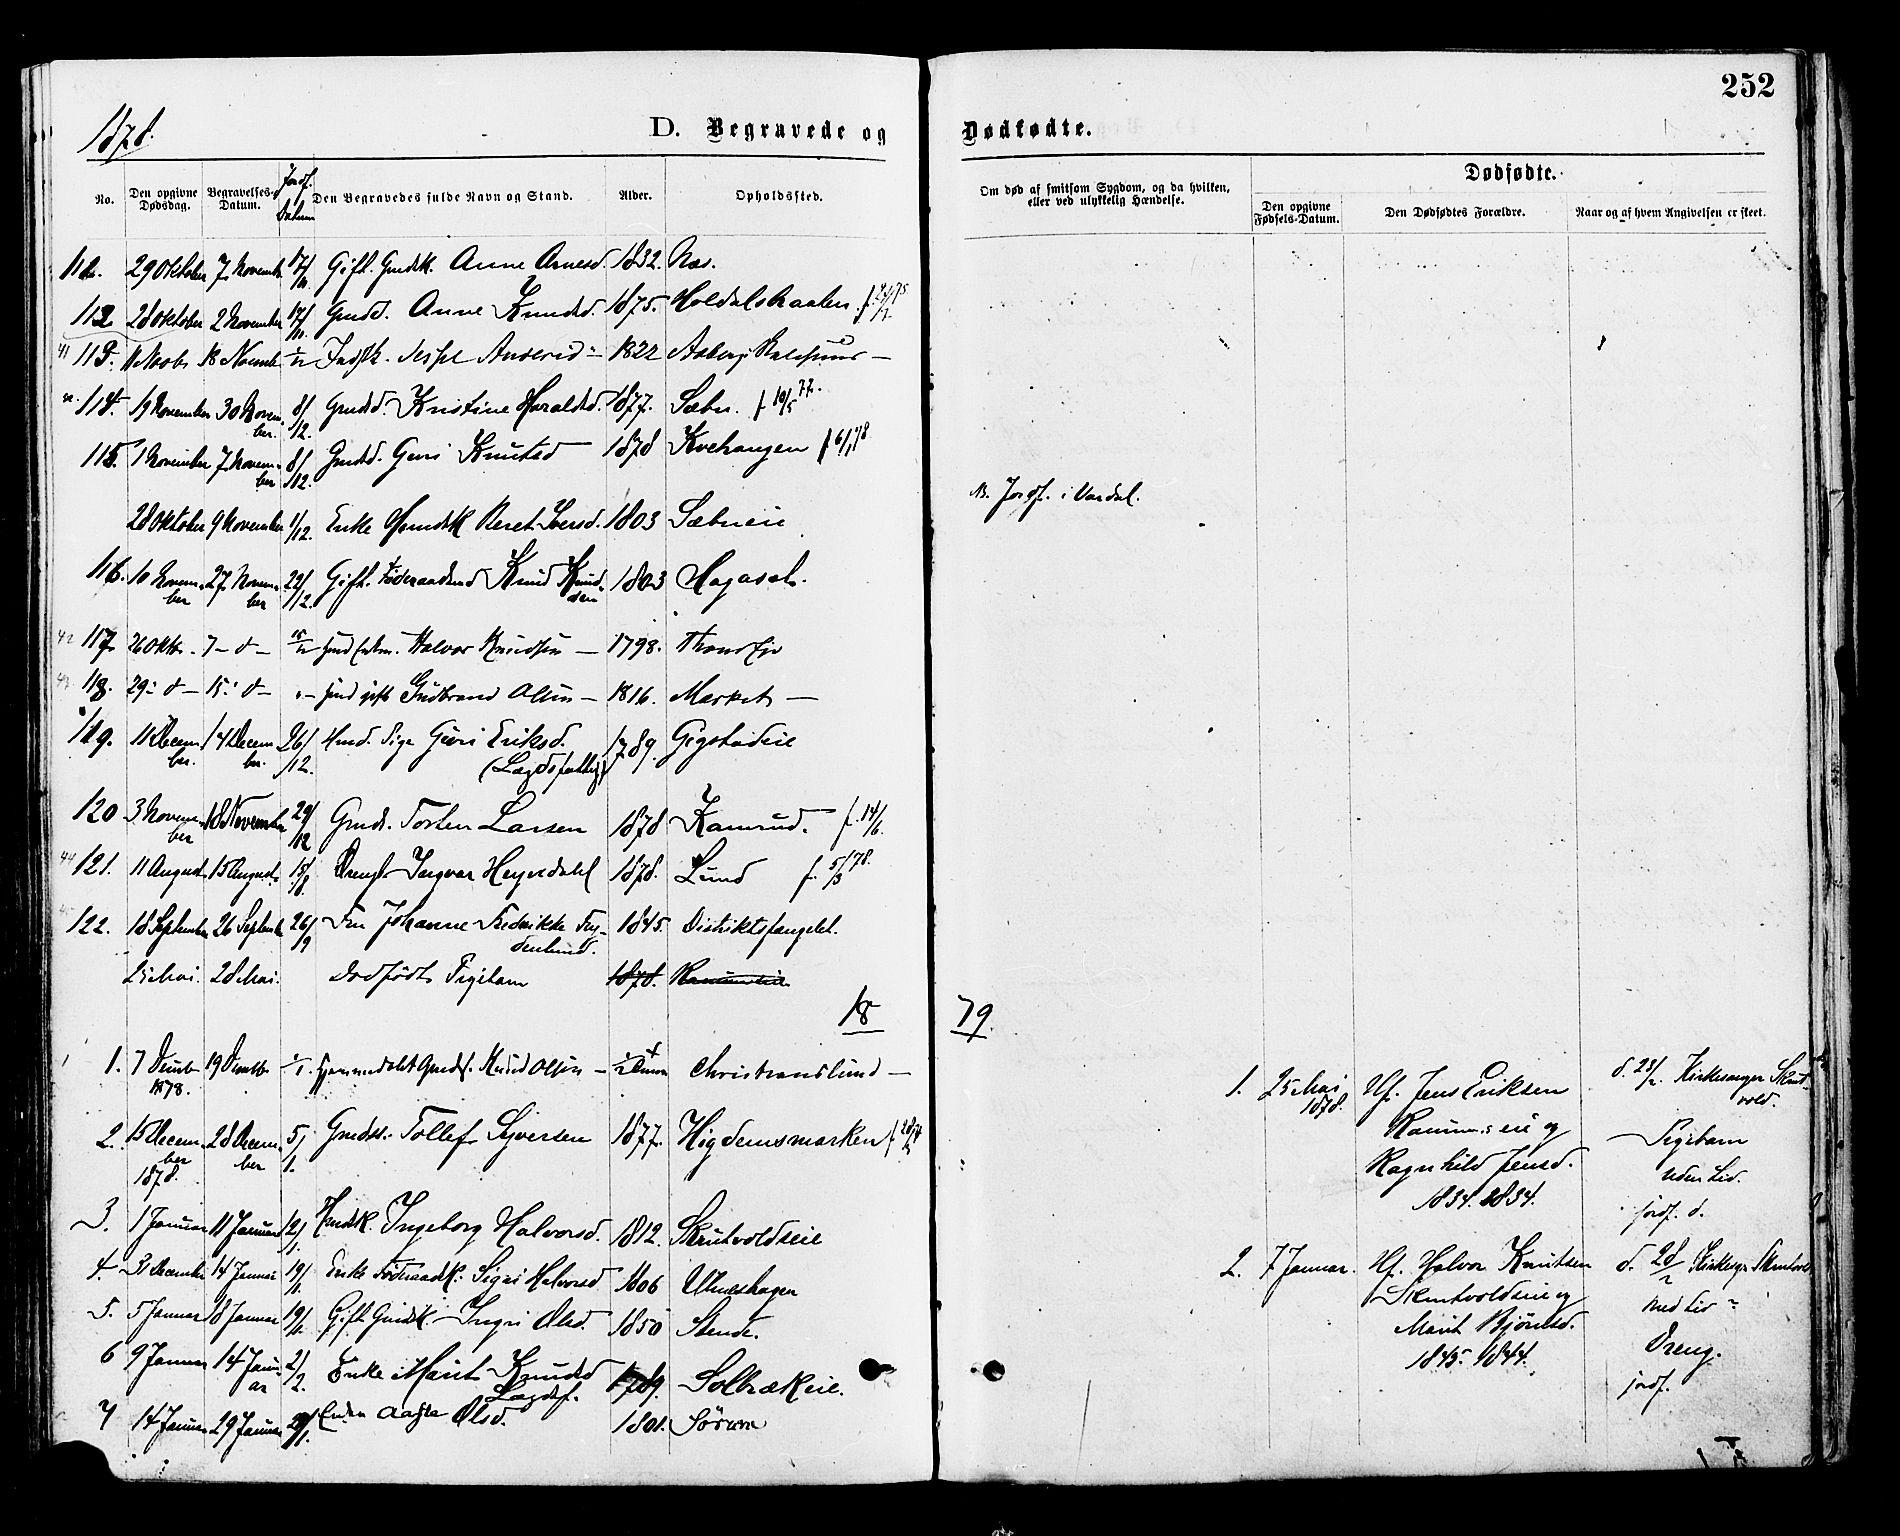 SAH, Nord-Aurdal prestekontor, Ministerialbok nr. 9, 1876-1882, s. 252